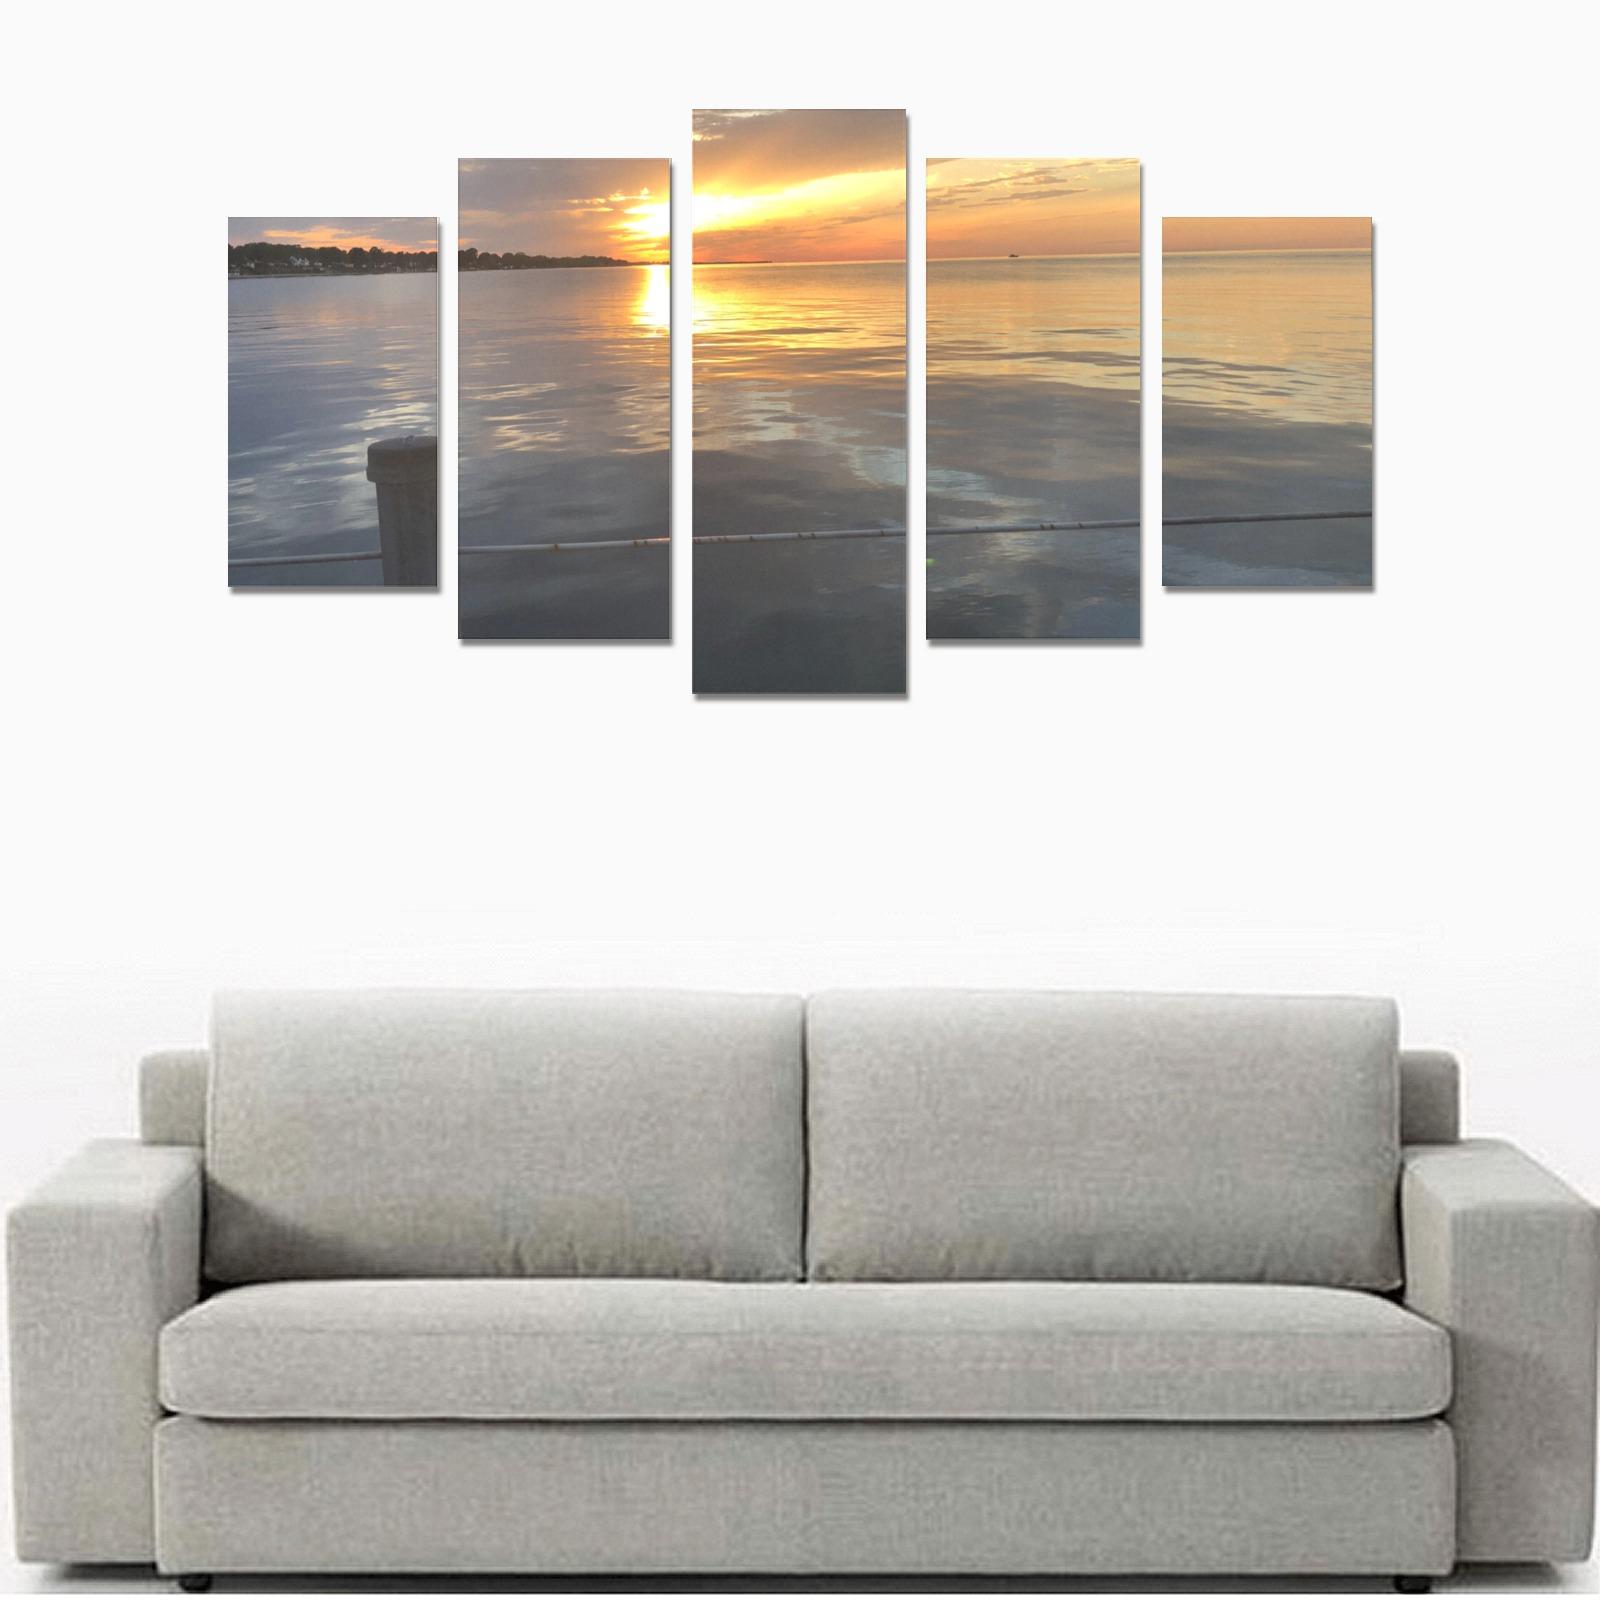 Pier Sunset Collection Canvas Print Sets A (No Frame)